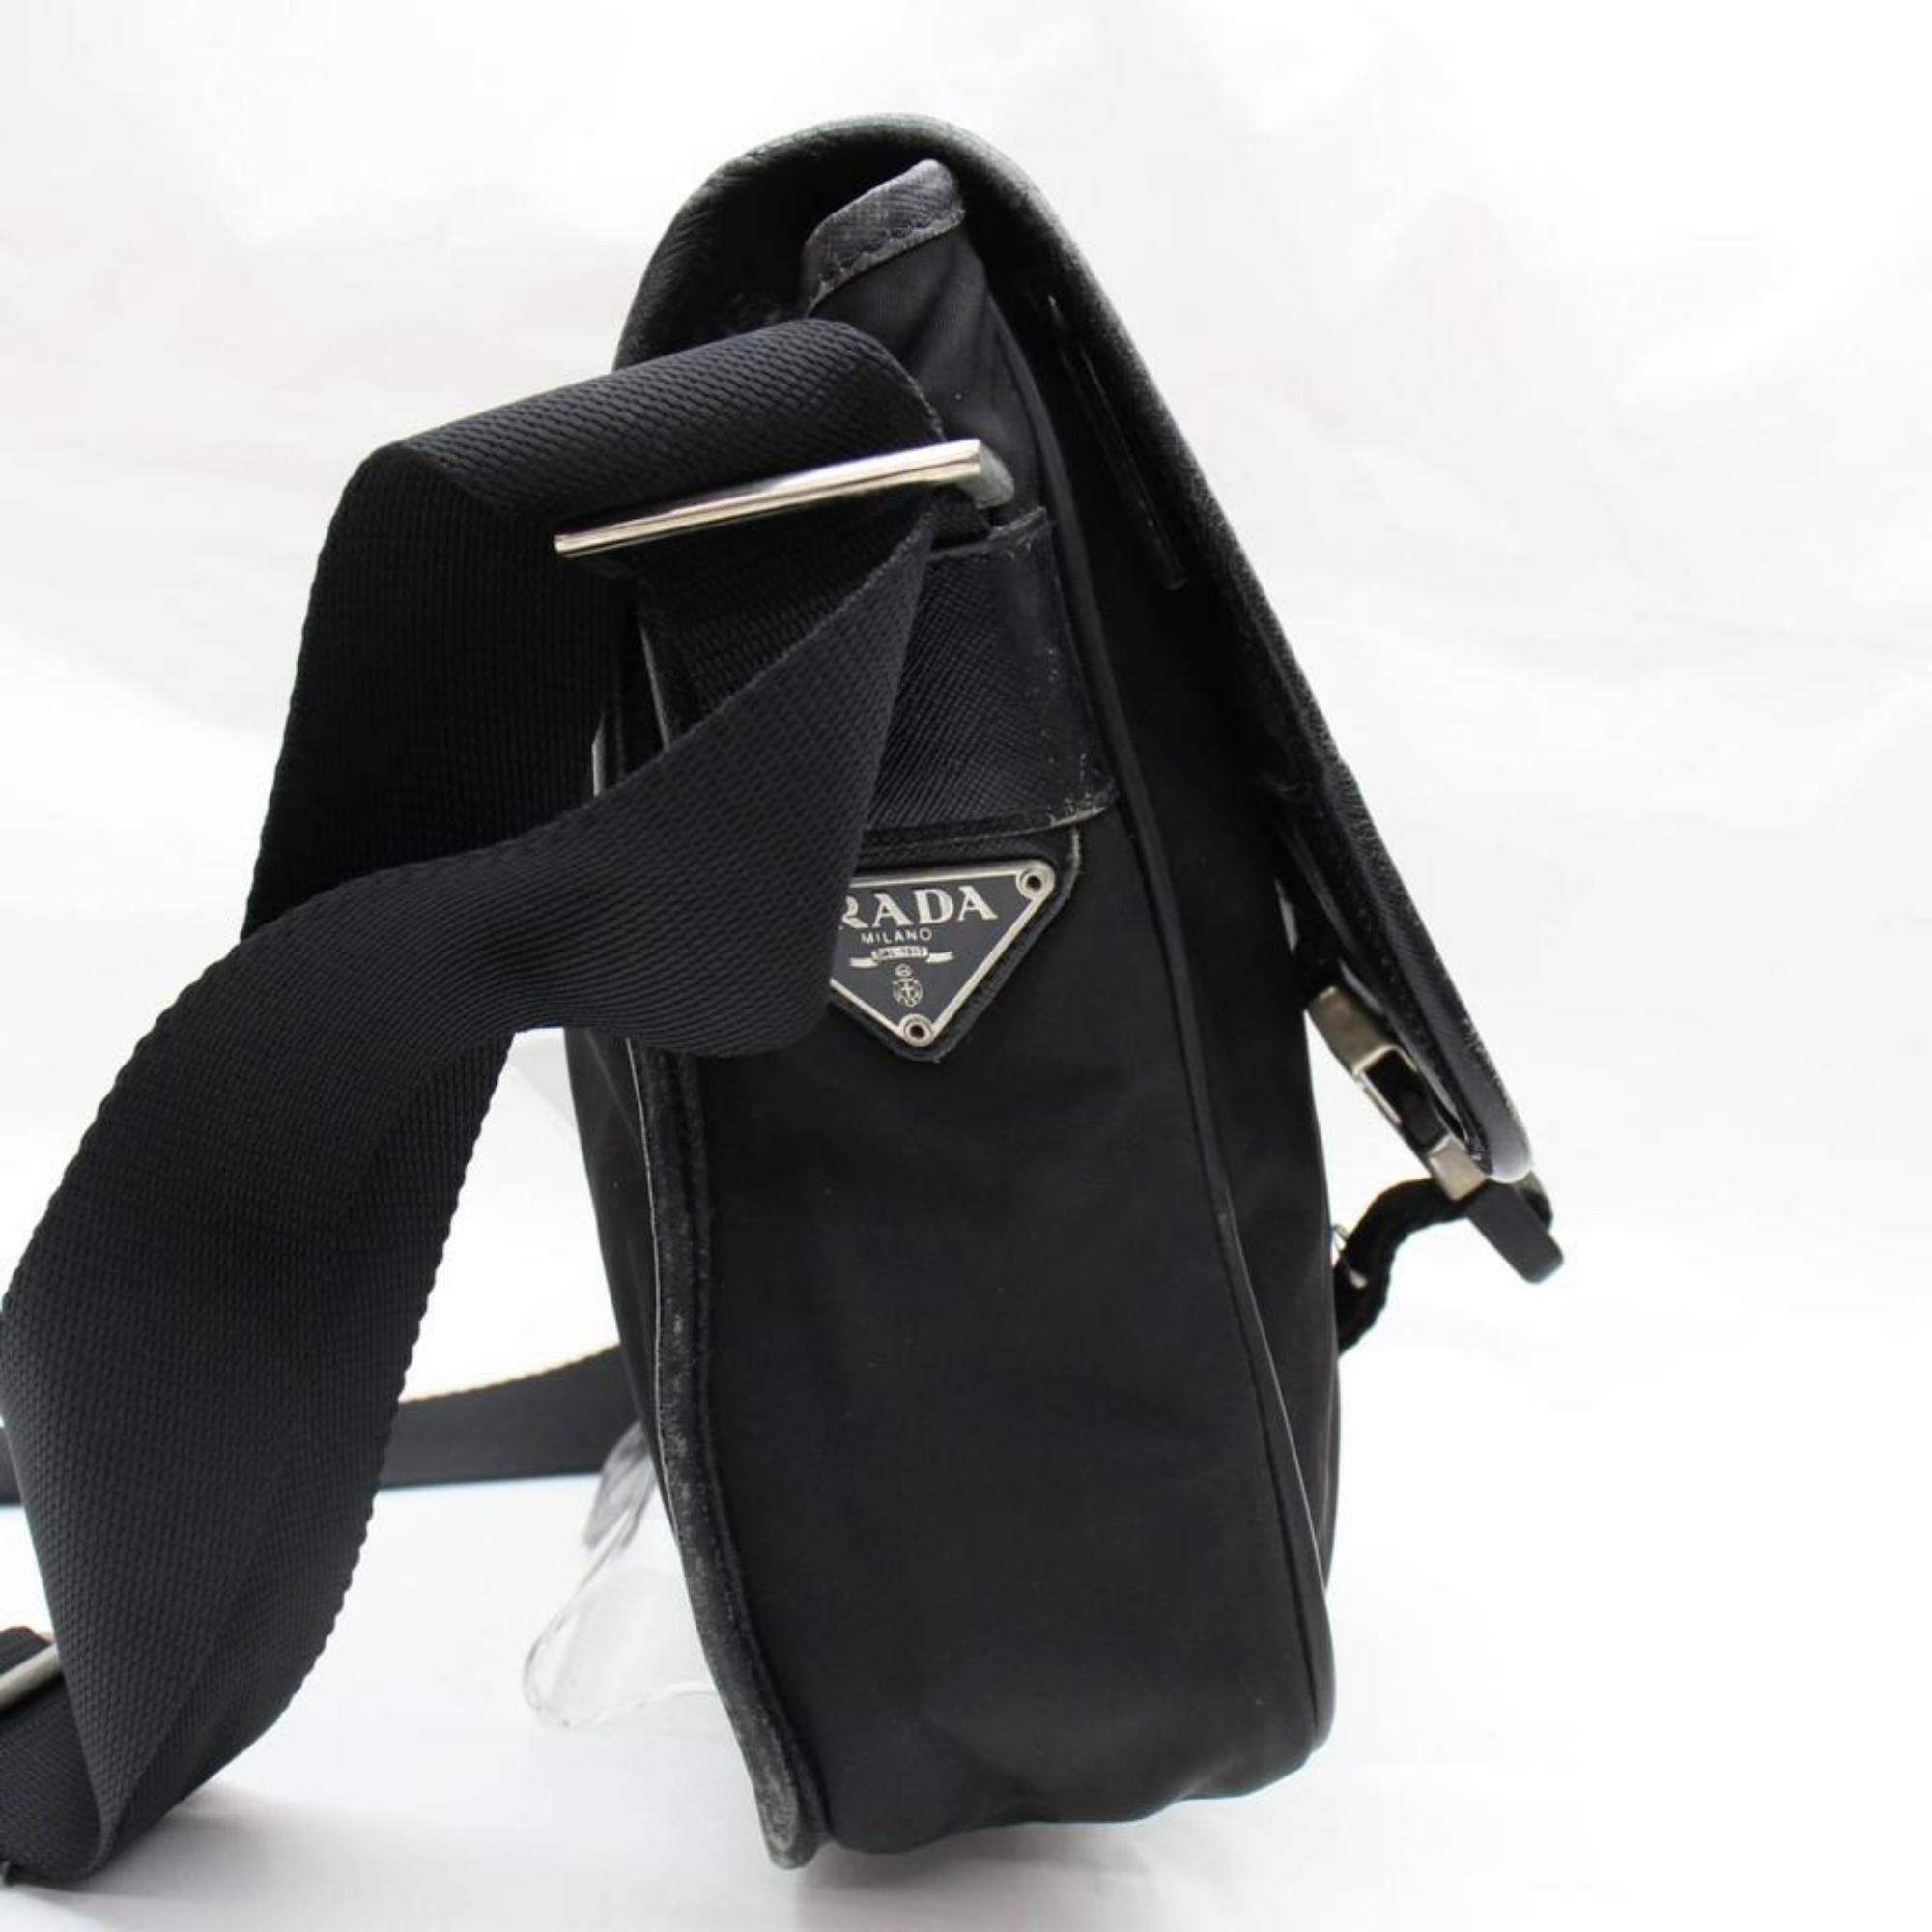 ad465d7ce9b3 Prada Tessuto Pack 867943 Black Nylon Cross Body Bag For Sale at 1stdibs